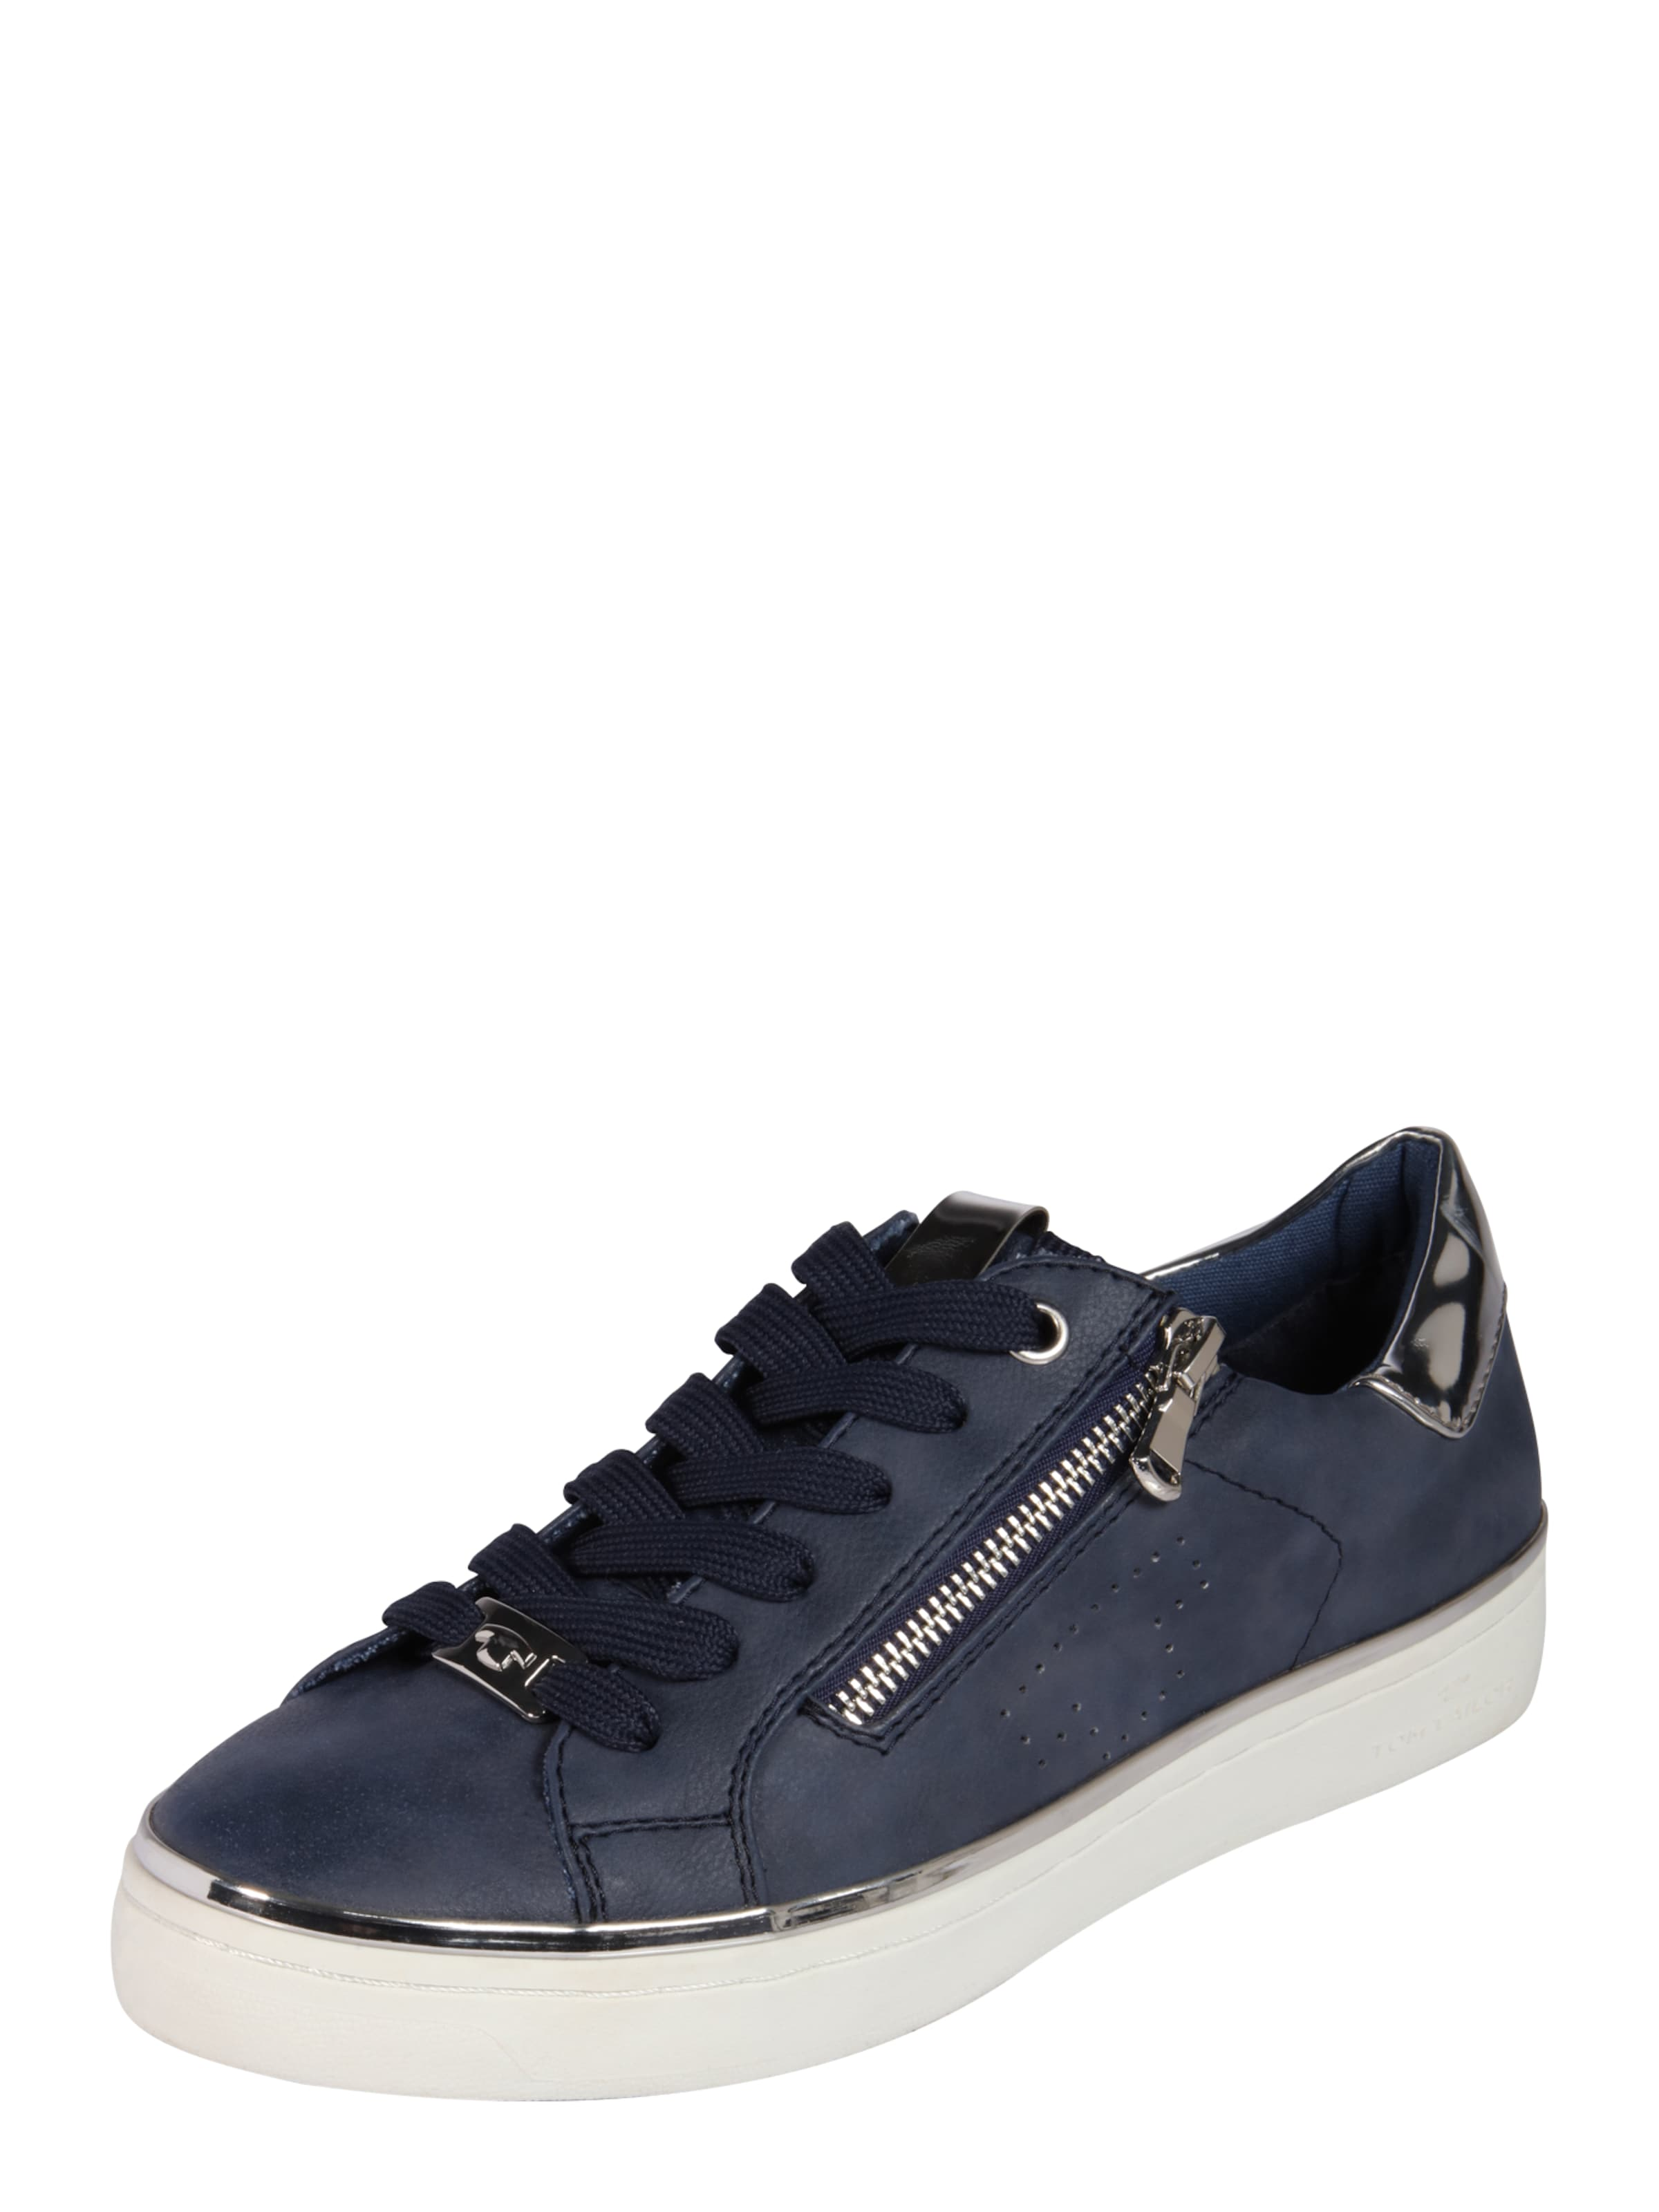 TOM TAILOR Sneaker mit Zipper Hohe Qualität